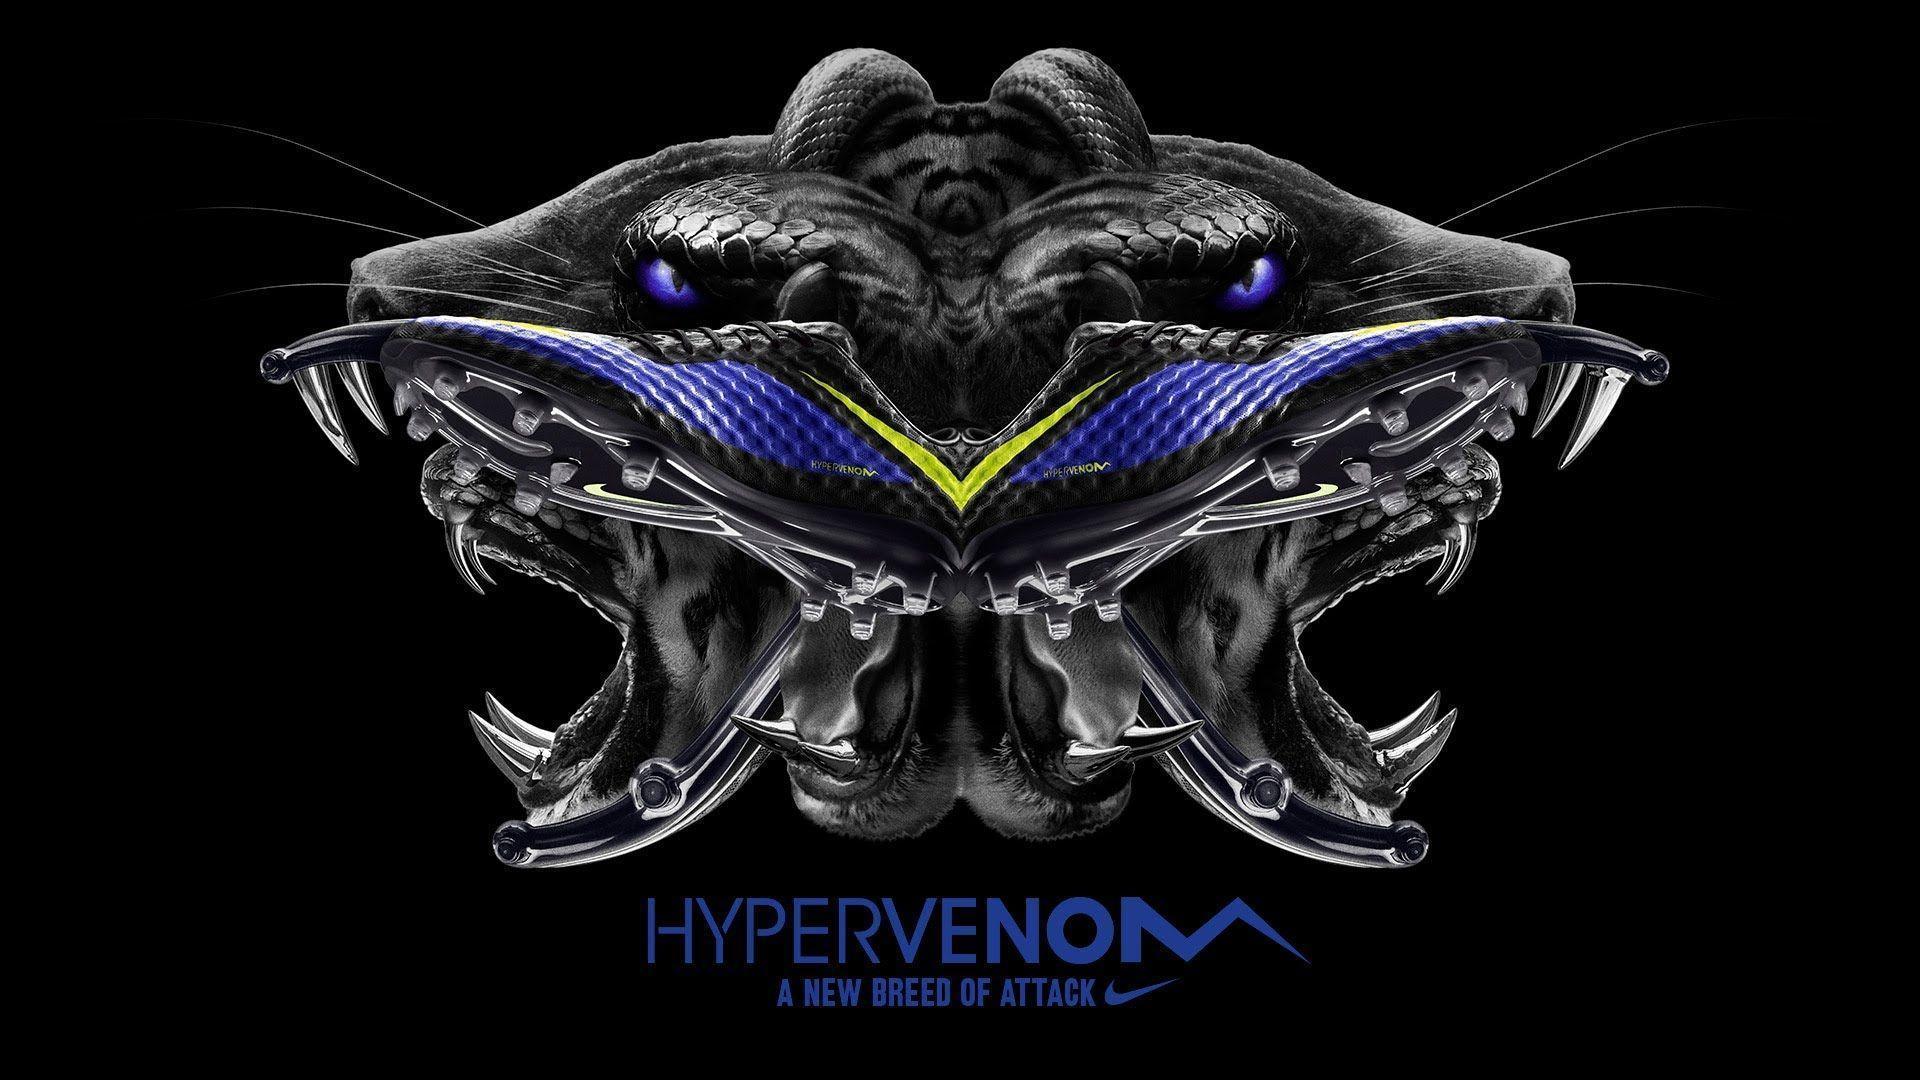 Nike Hypervenom Wallpapers - Wallpaper Cave